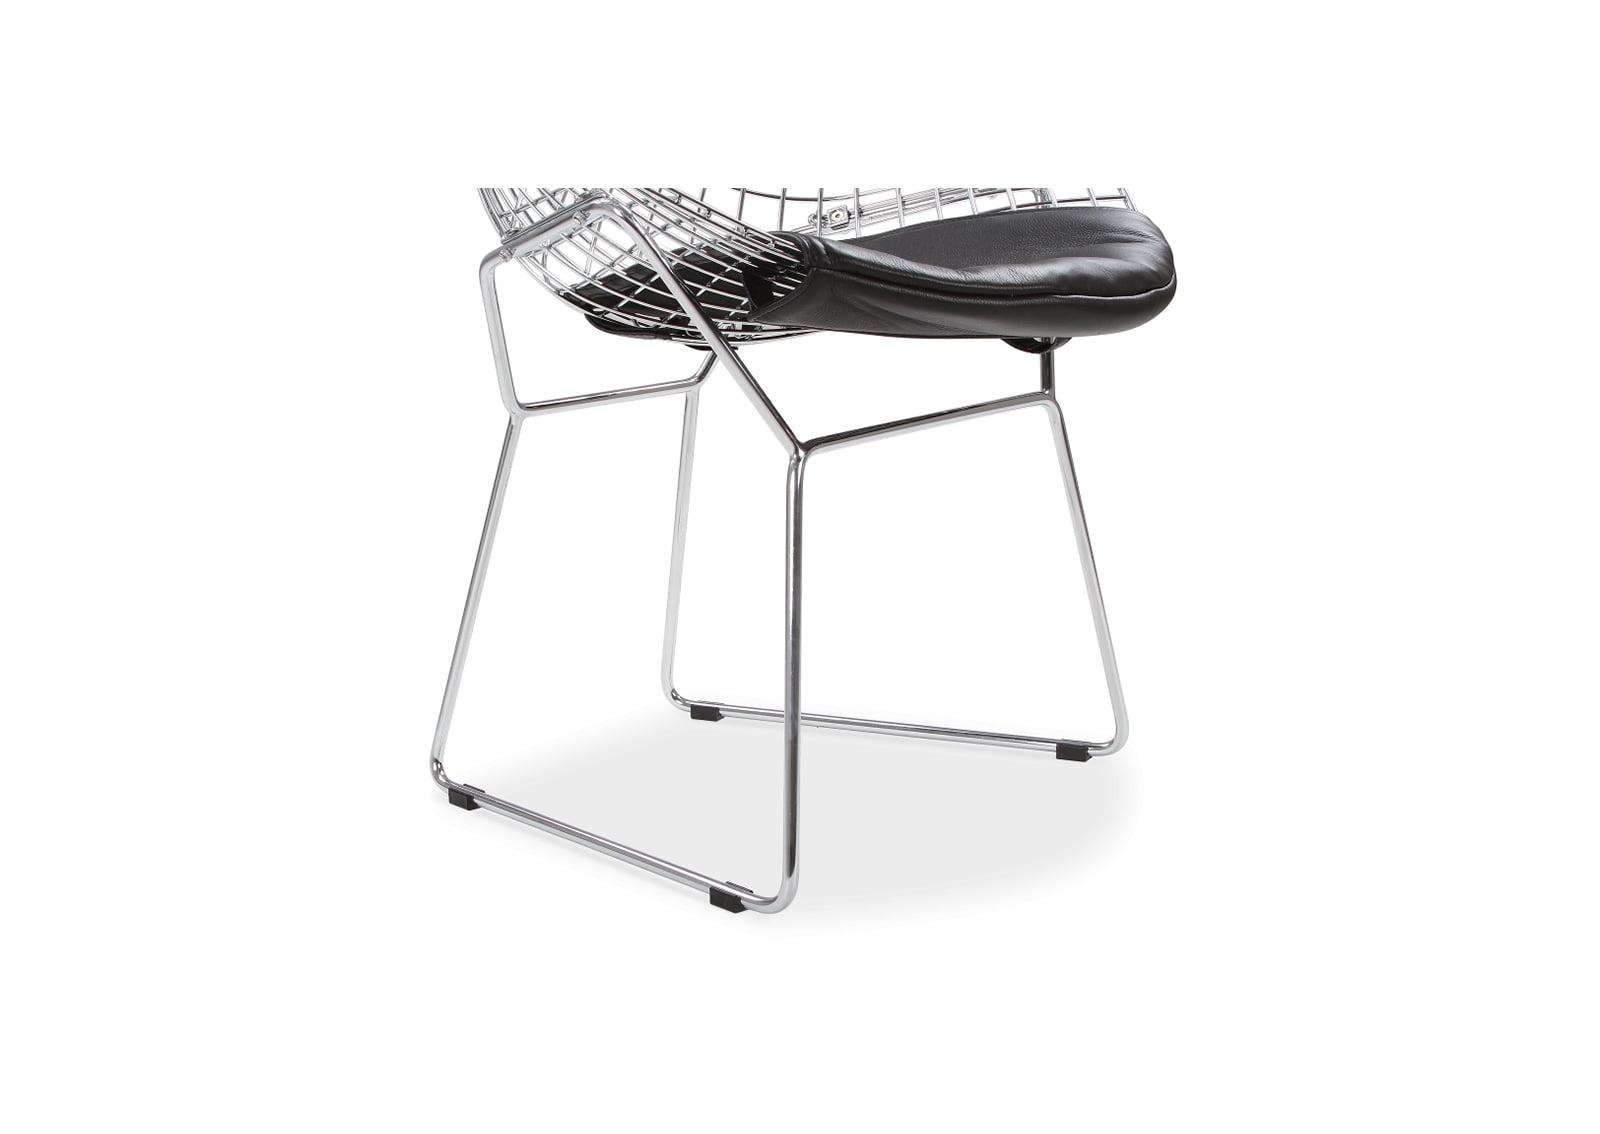 bertoia style chair kd smart battery harry mid century modern furniture